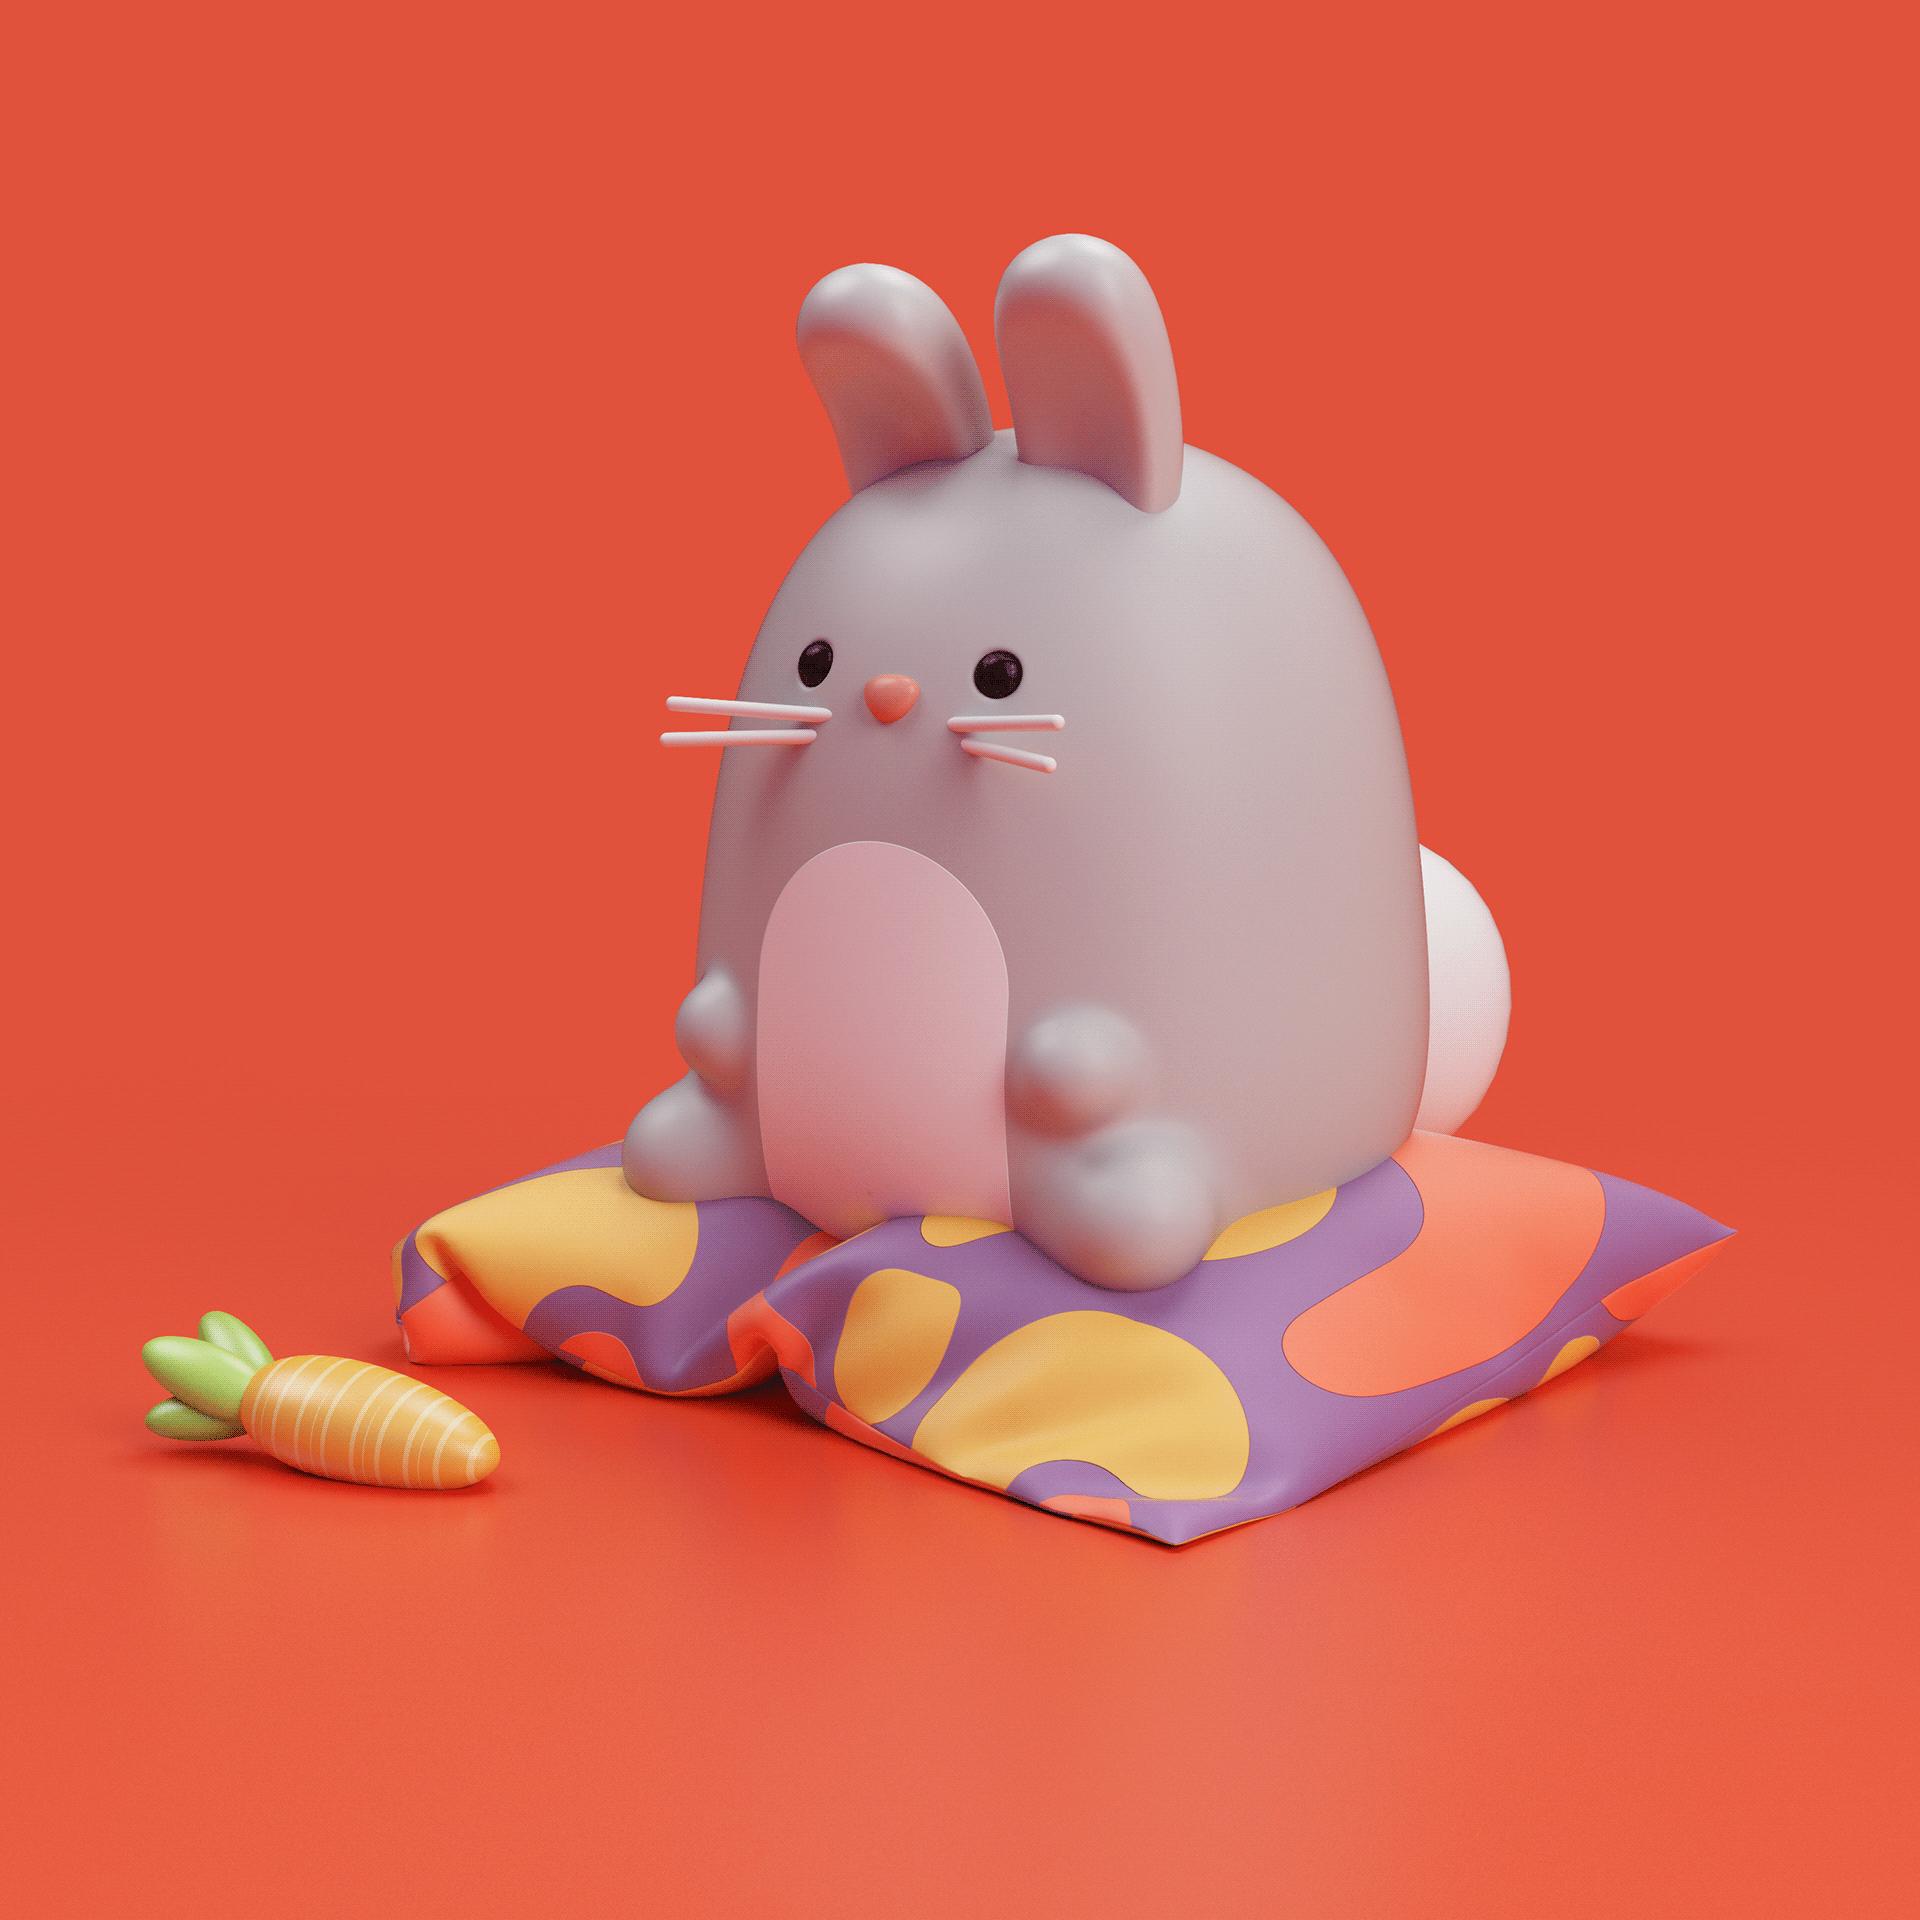 Art Direction,Toy Design,Illustration